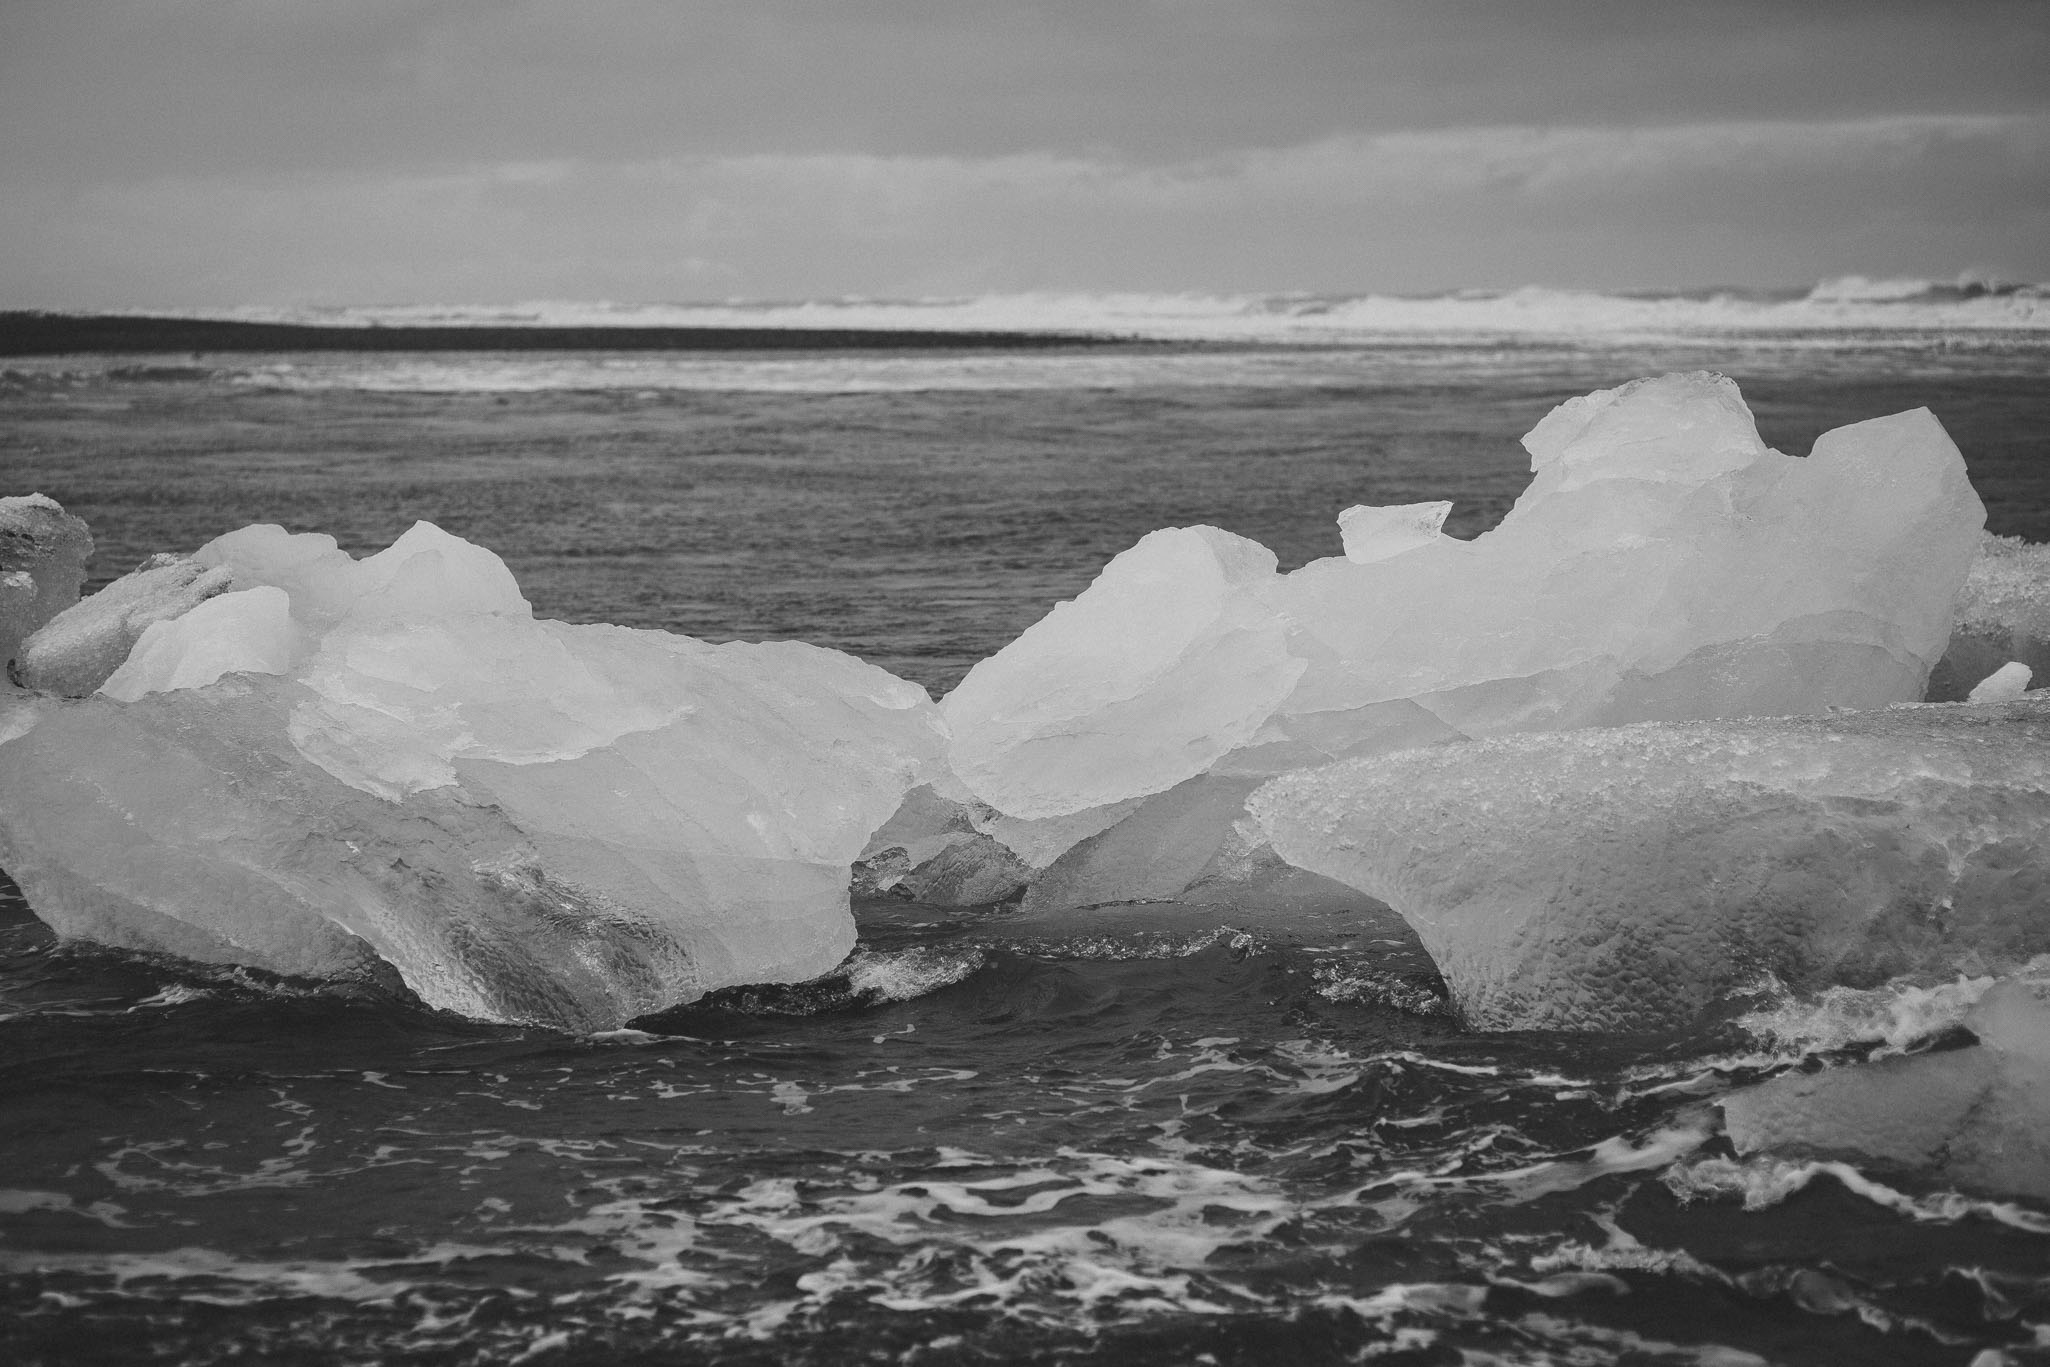 Road-trip-Islande-Iceland-Voyage-Travel-Portrait-Jérémy-Boyer-Jokulsarlon-Ice-Beach-plage-glace-13.jpg